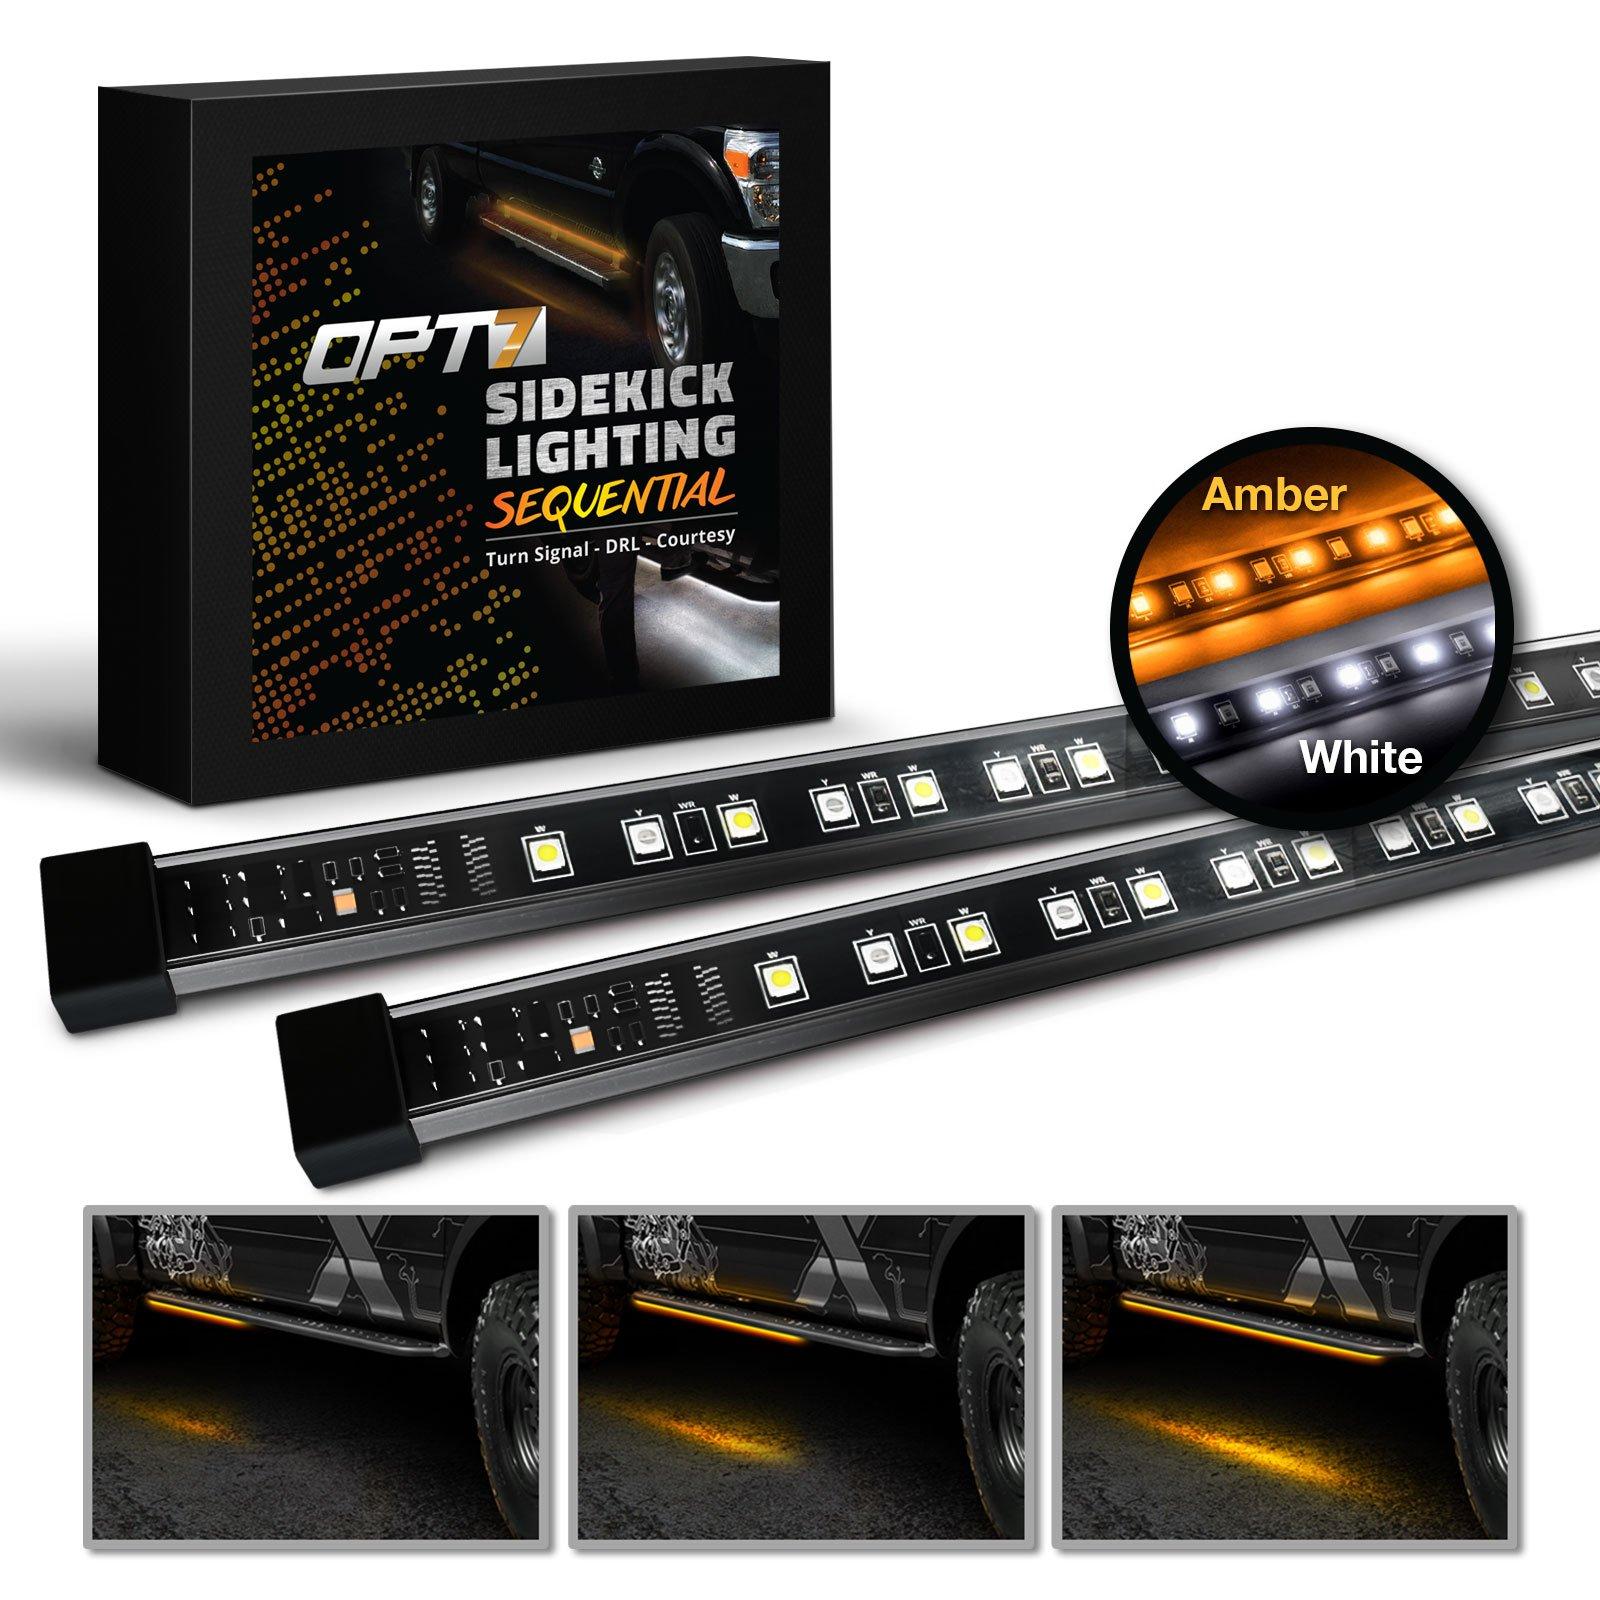 cciyu 40 Pack T5 3-3014-SMD Instrument Dashboard LED Light Bulbs 17 37 73 2721 74 Car 803492-5210-1202141